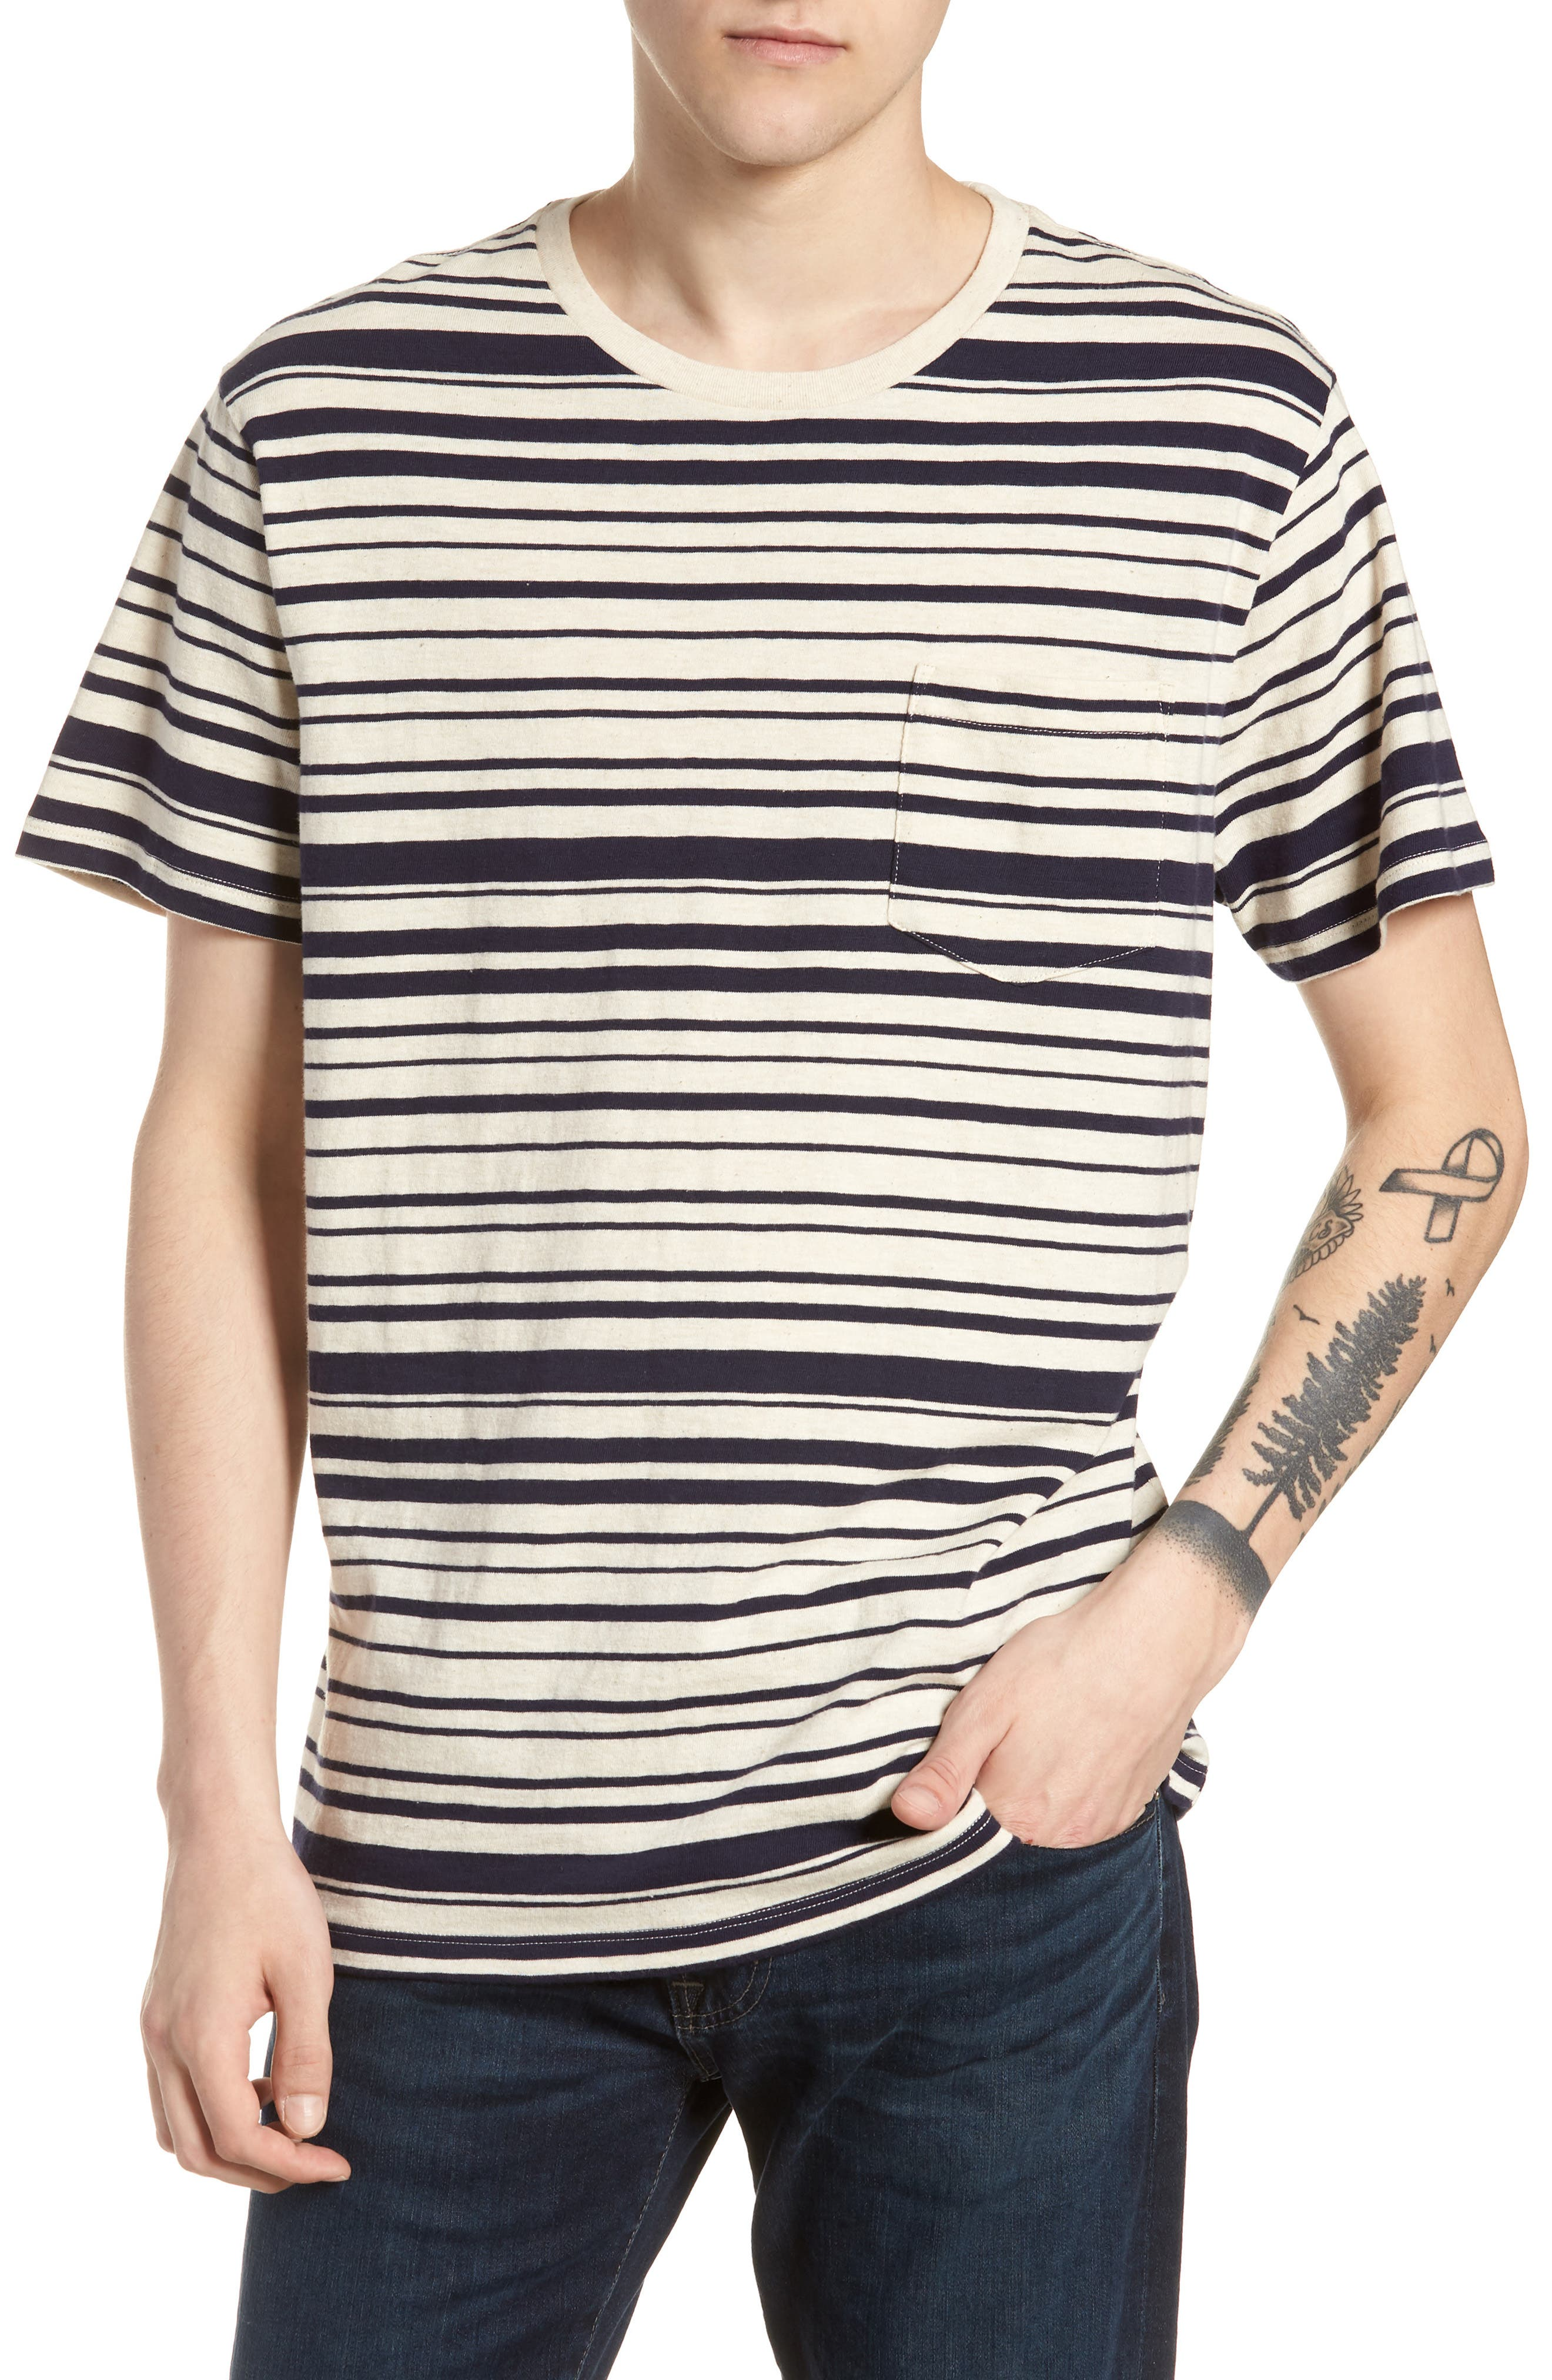 Variegated Stripe Slub Cotton T-Shirt,                         Main,                         color, Ivory Navy